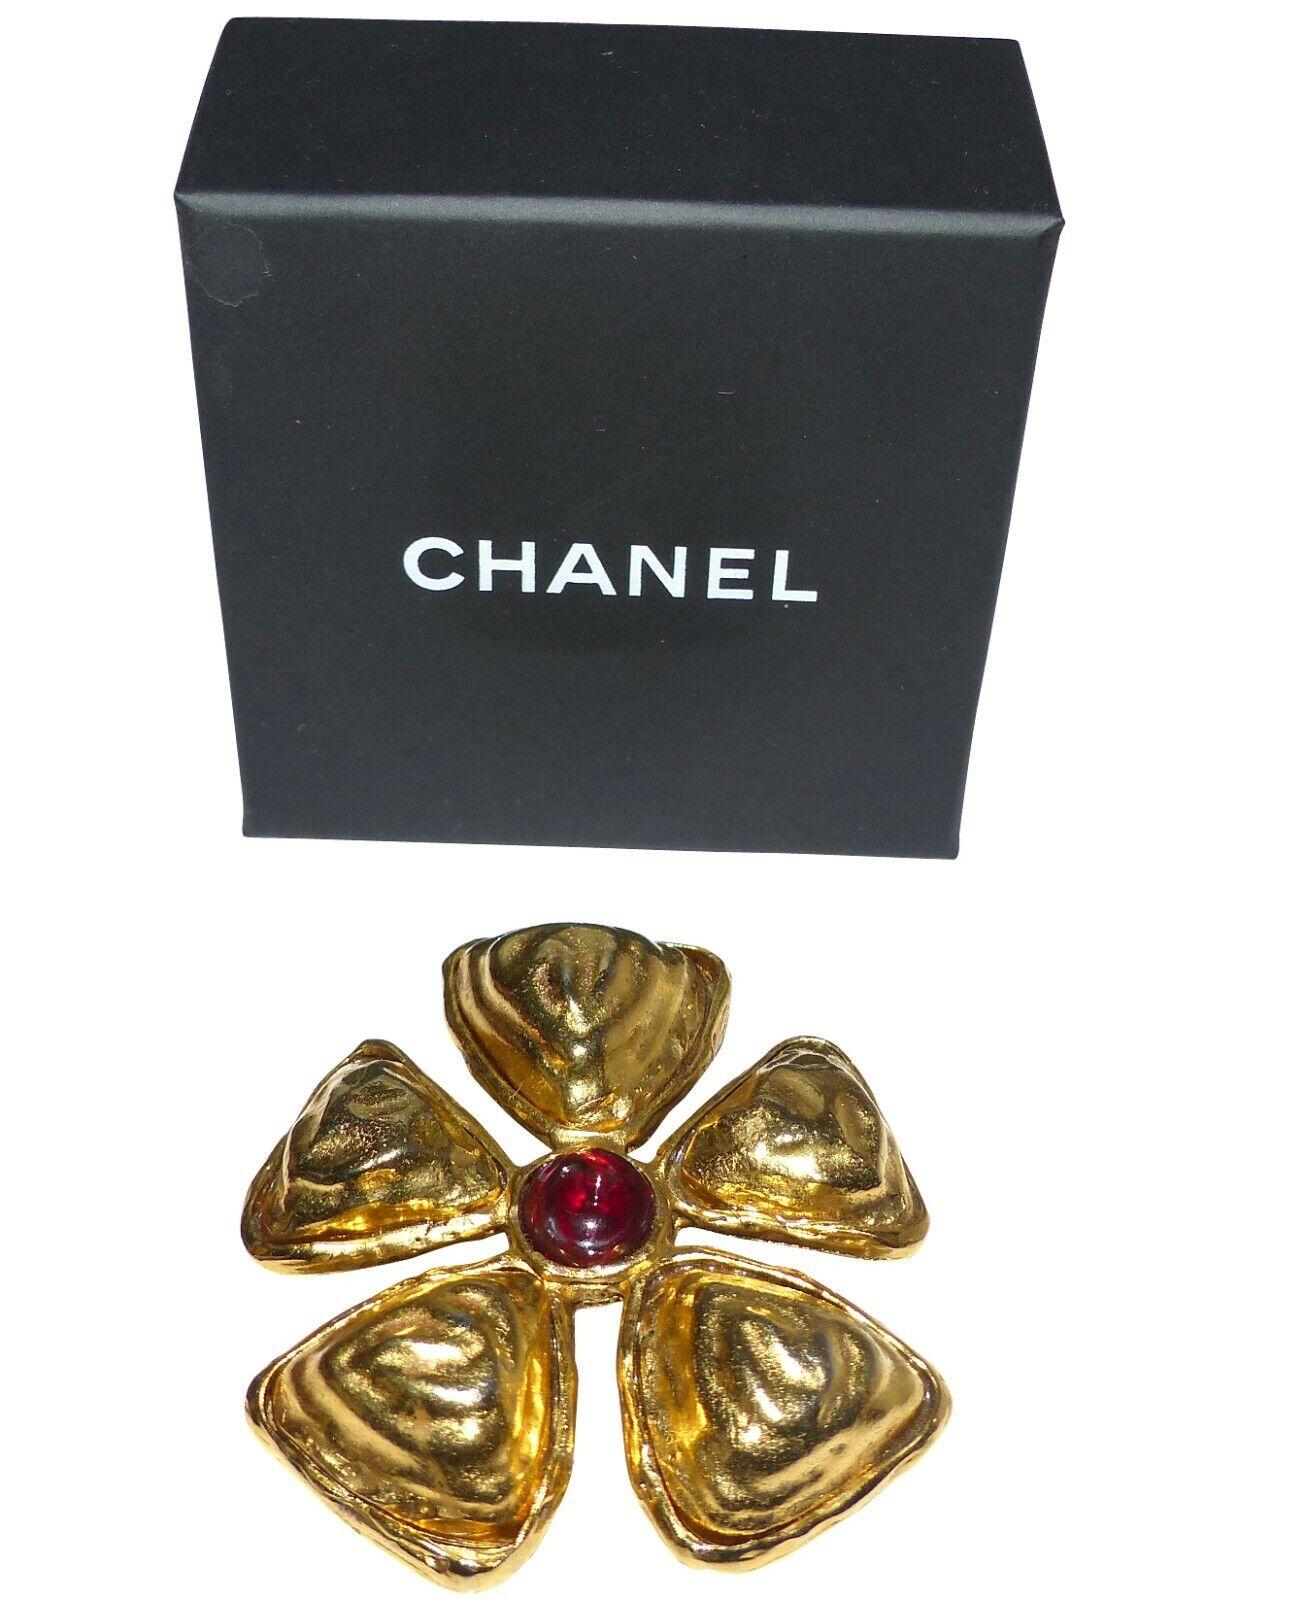 Chanel - broche vintage en mÉtal martelÉ et pate de verre - chanel brooch